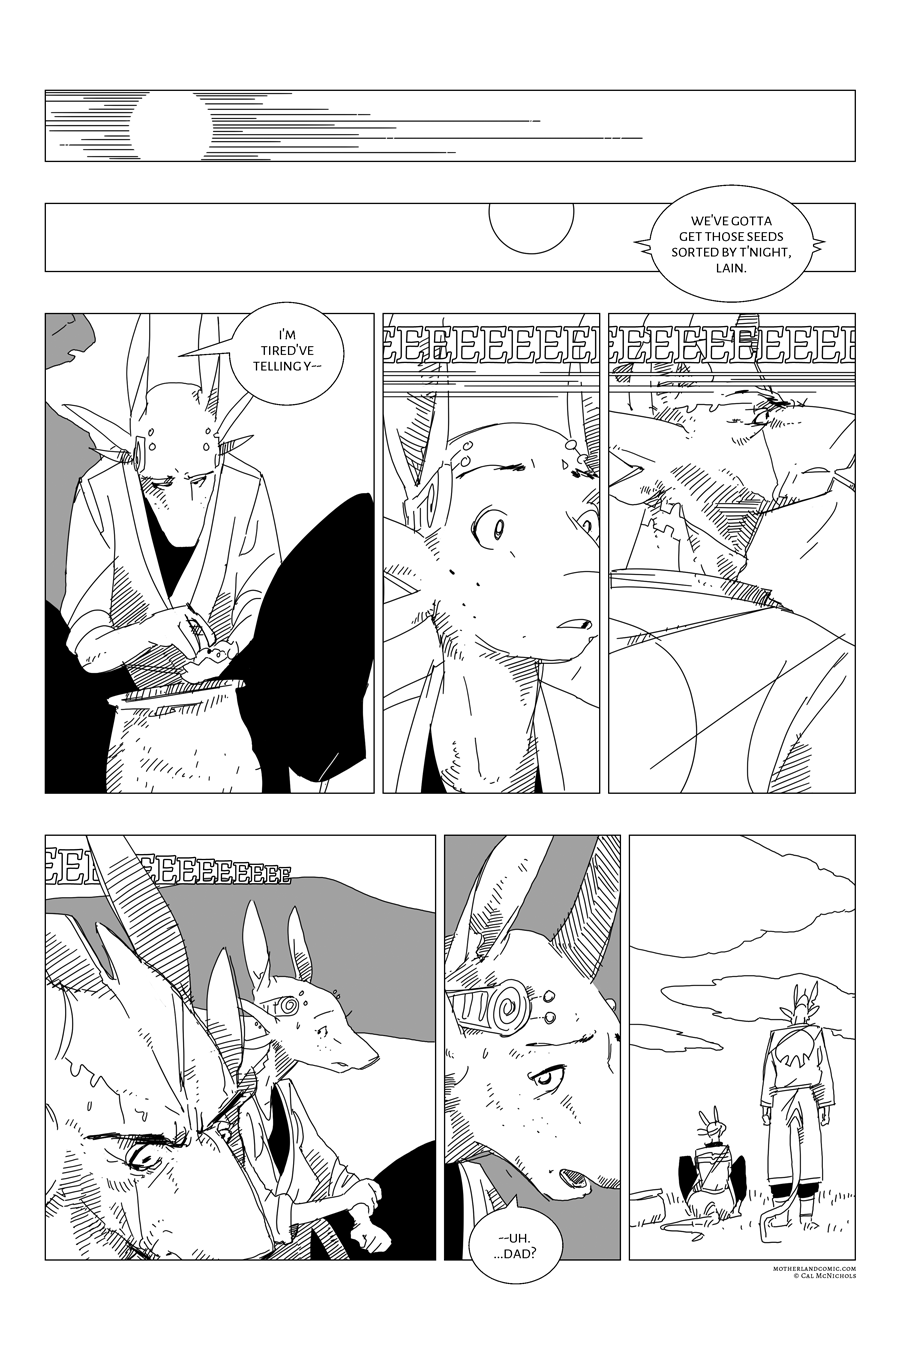 pg 64